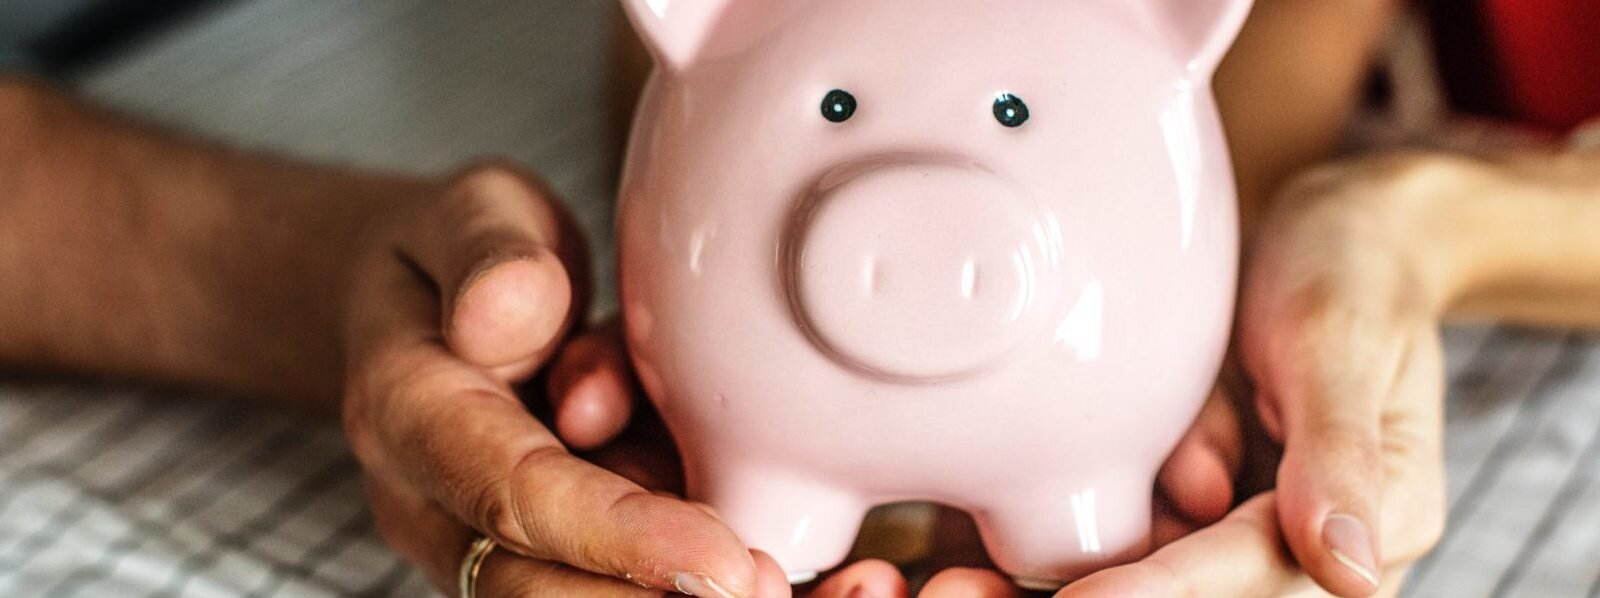 cash-cent-child-1246954-e1566359138893-1600x598.jpg